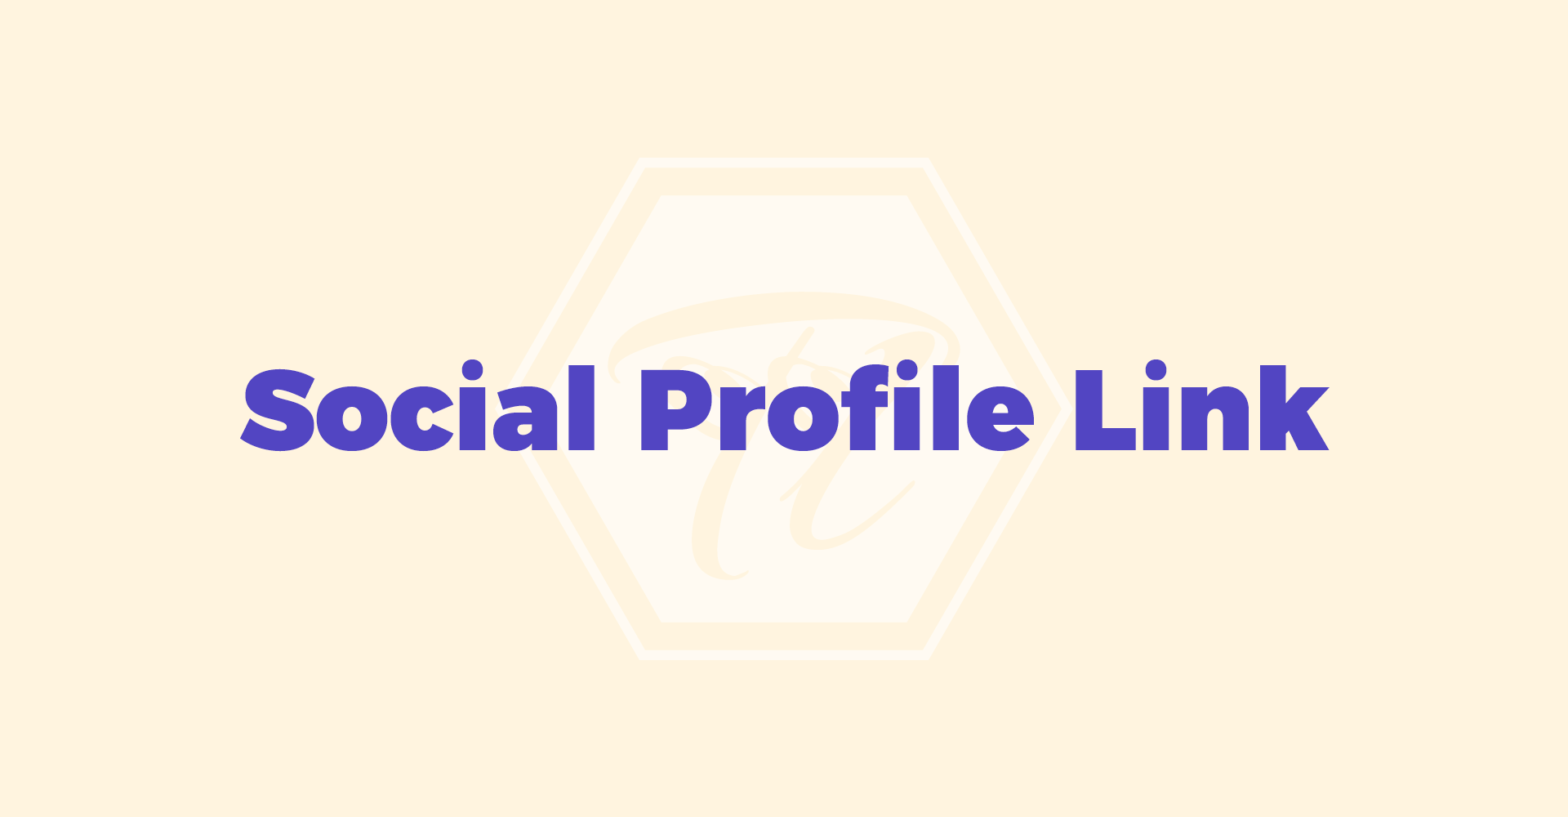 social_profile_link 1568x817